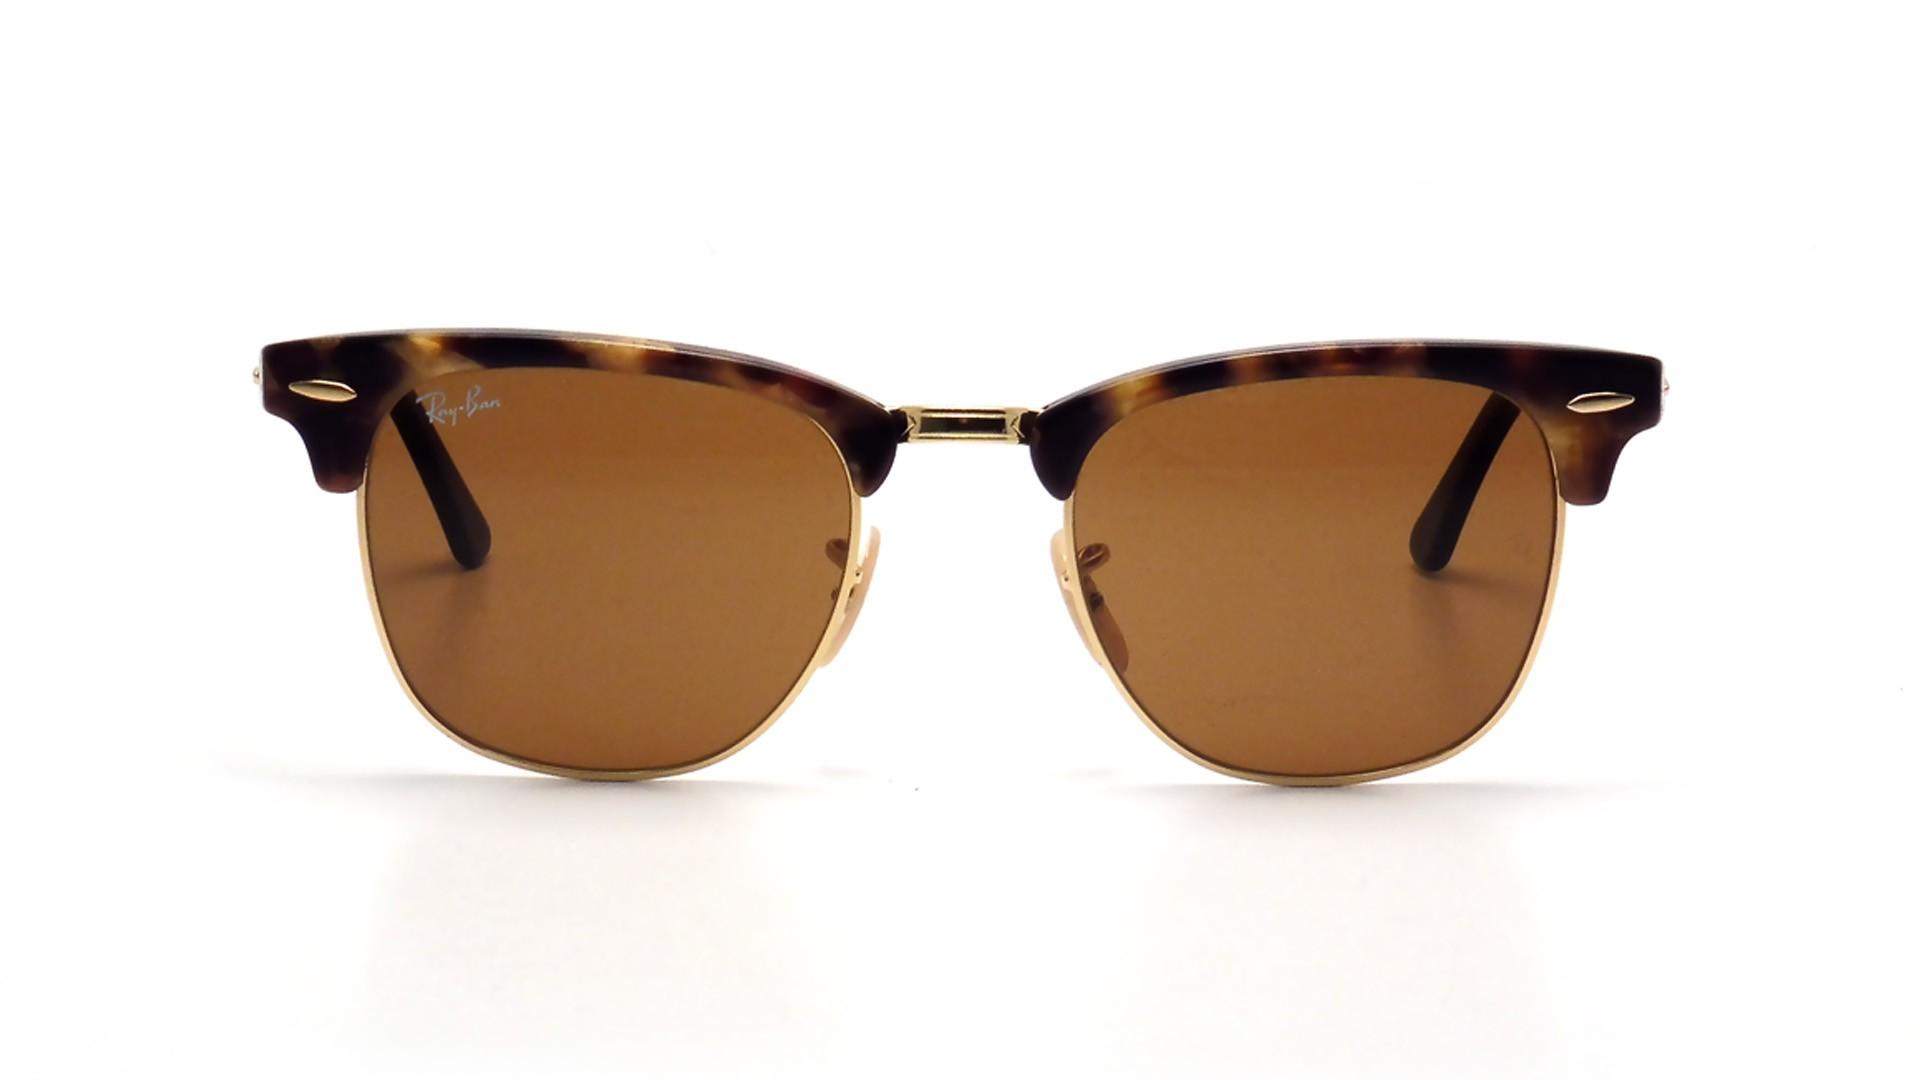 70c7db97a1c ... where can i buy sunglasses ray ban clubmaster fleck tortoise rb3016  1160 49 21 medium eb074